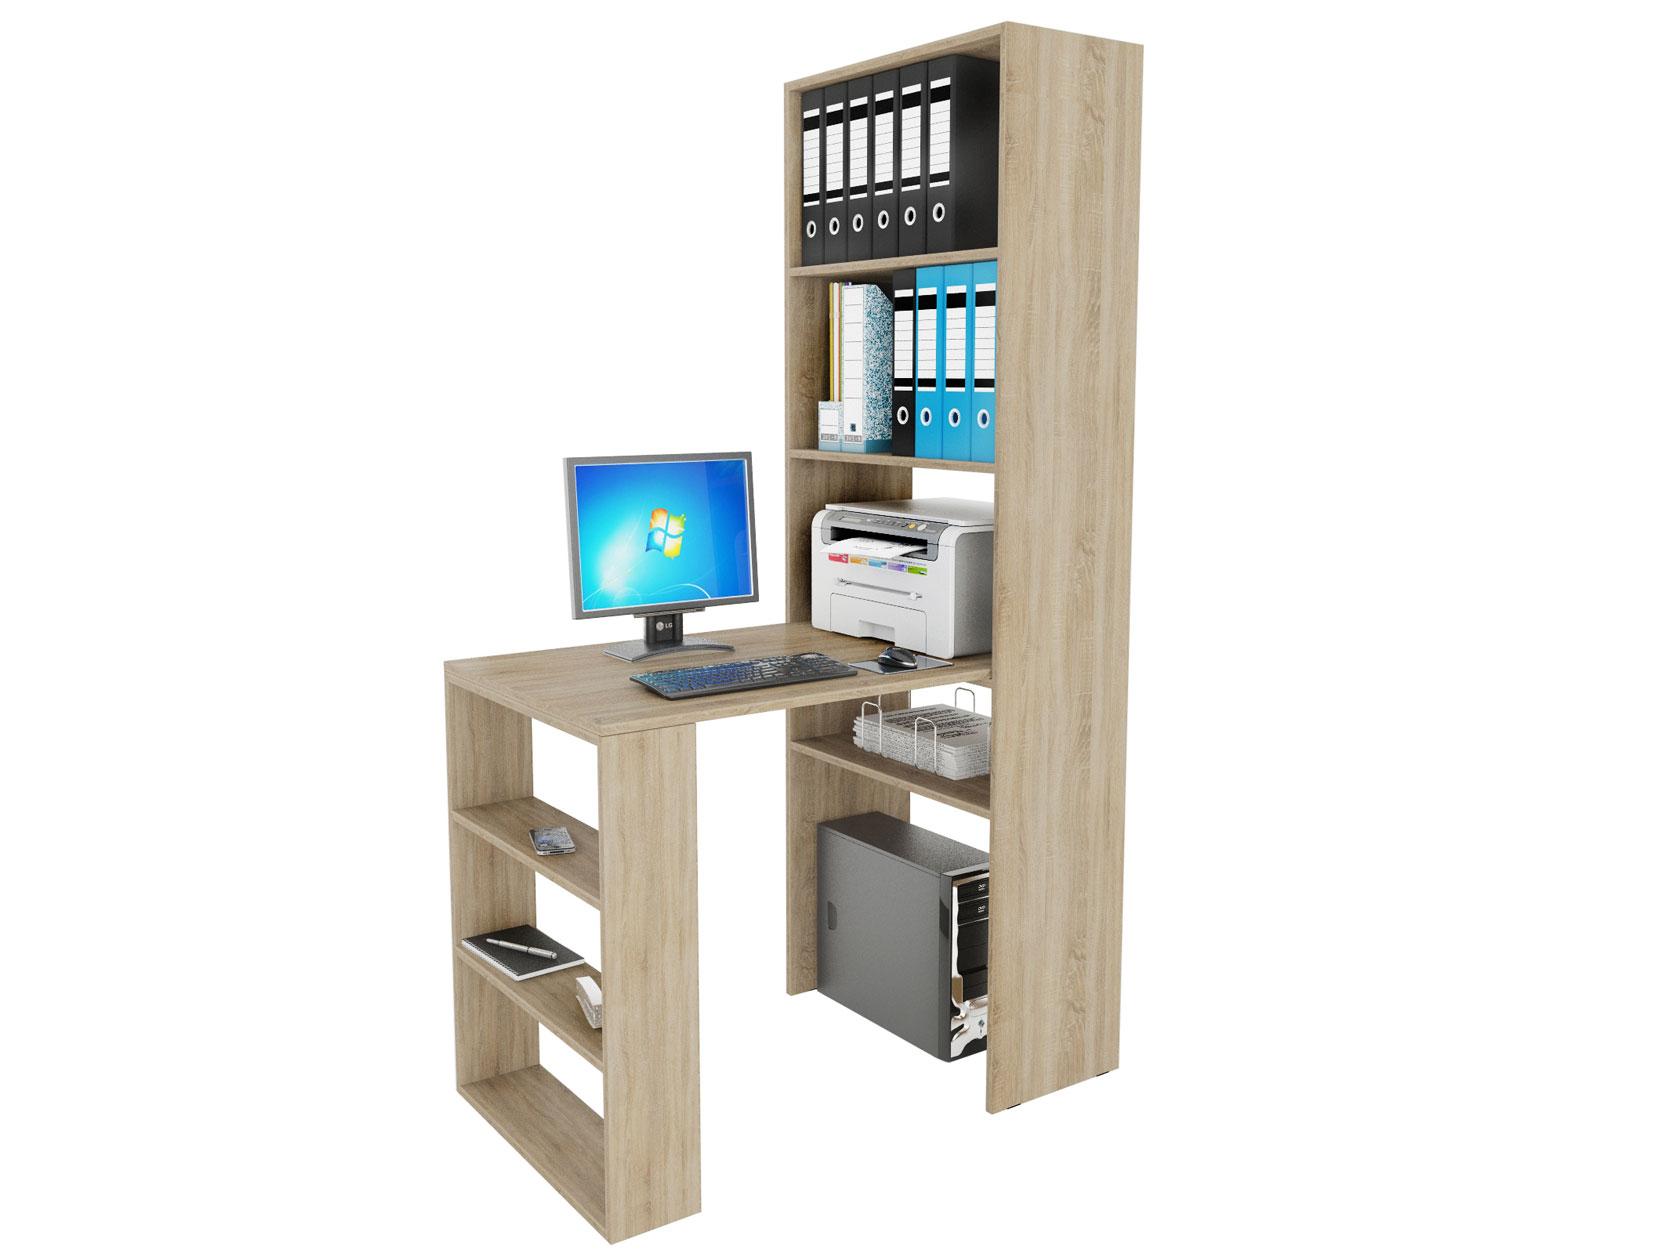 Компьютерный стол в комплекте МФ Мастер Рикс-4+Рикс-5 110x63,2x177, дуб сонома